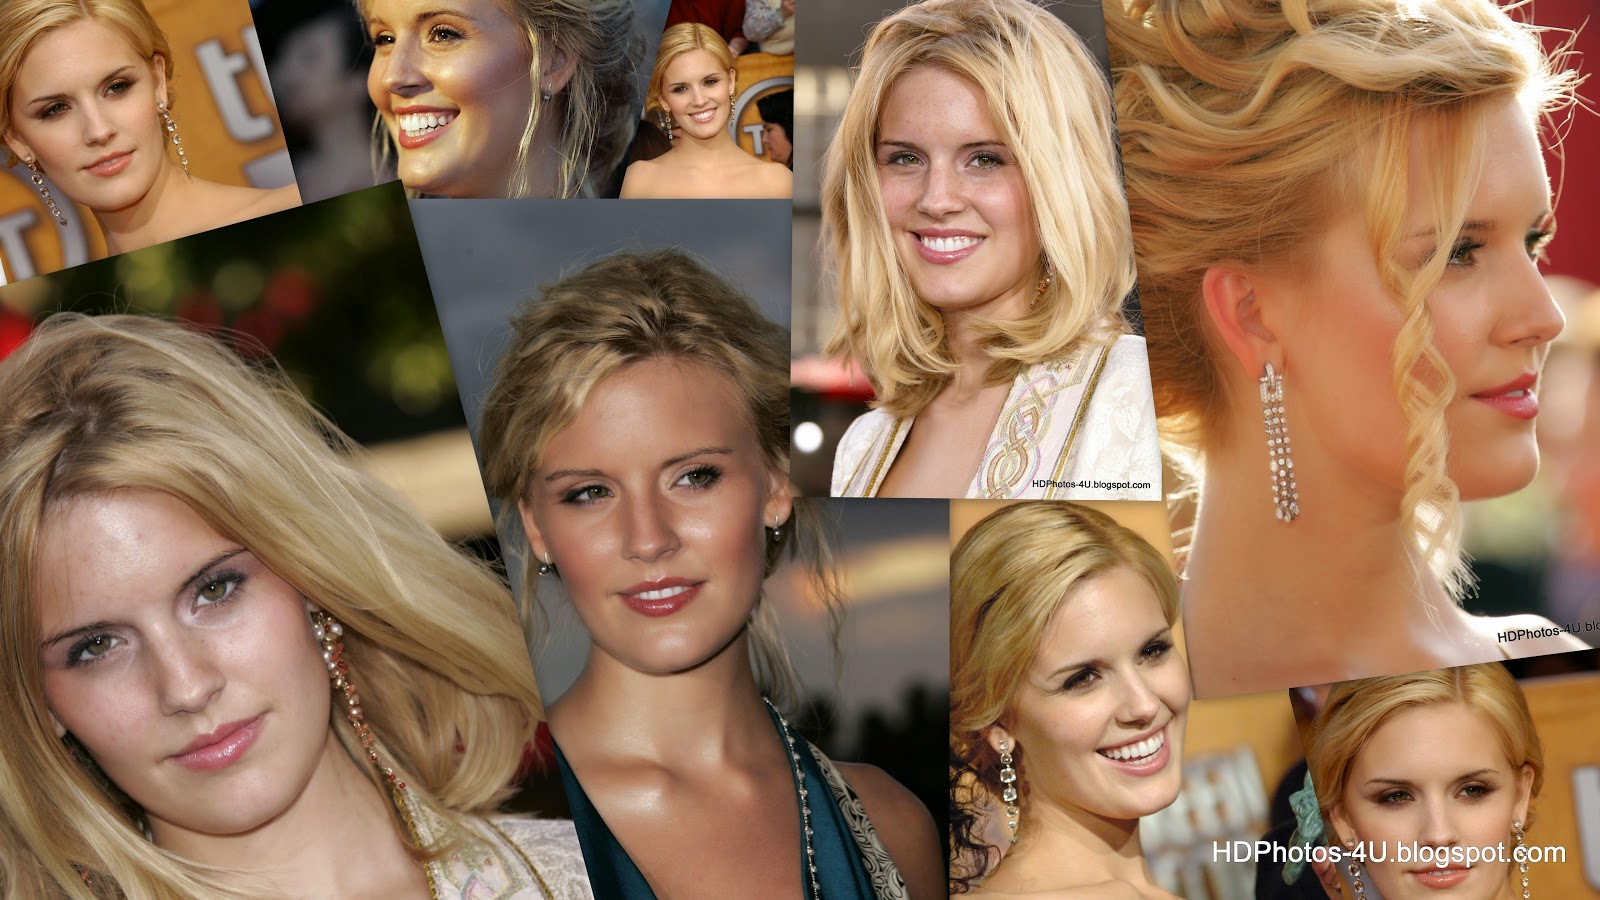 taken 3 actress fantastic hd photos & wallpapers of maggie grace p-1